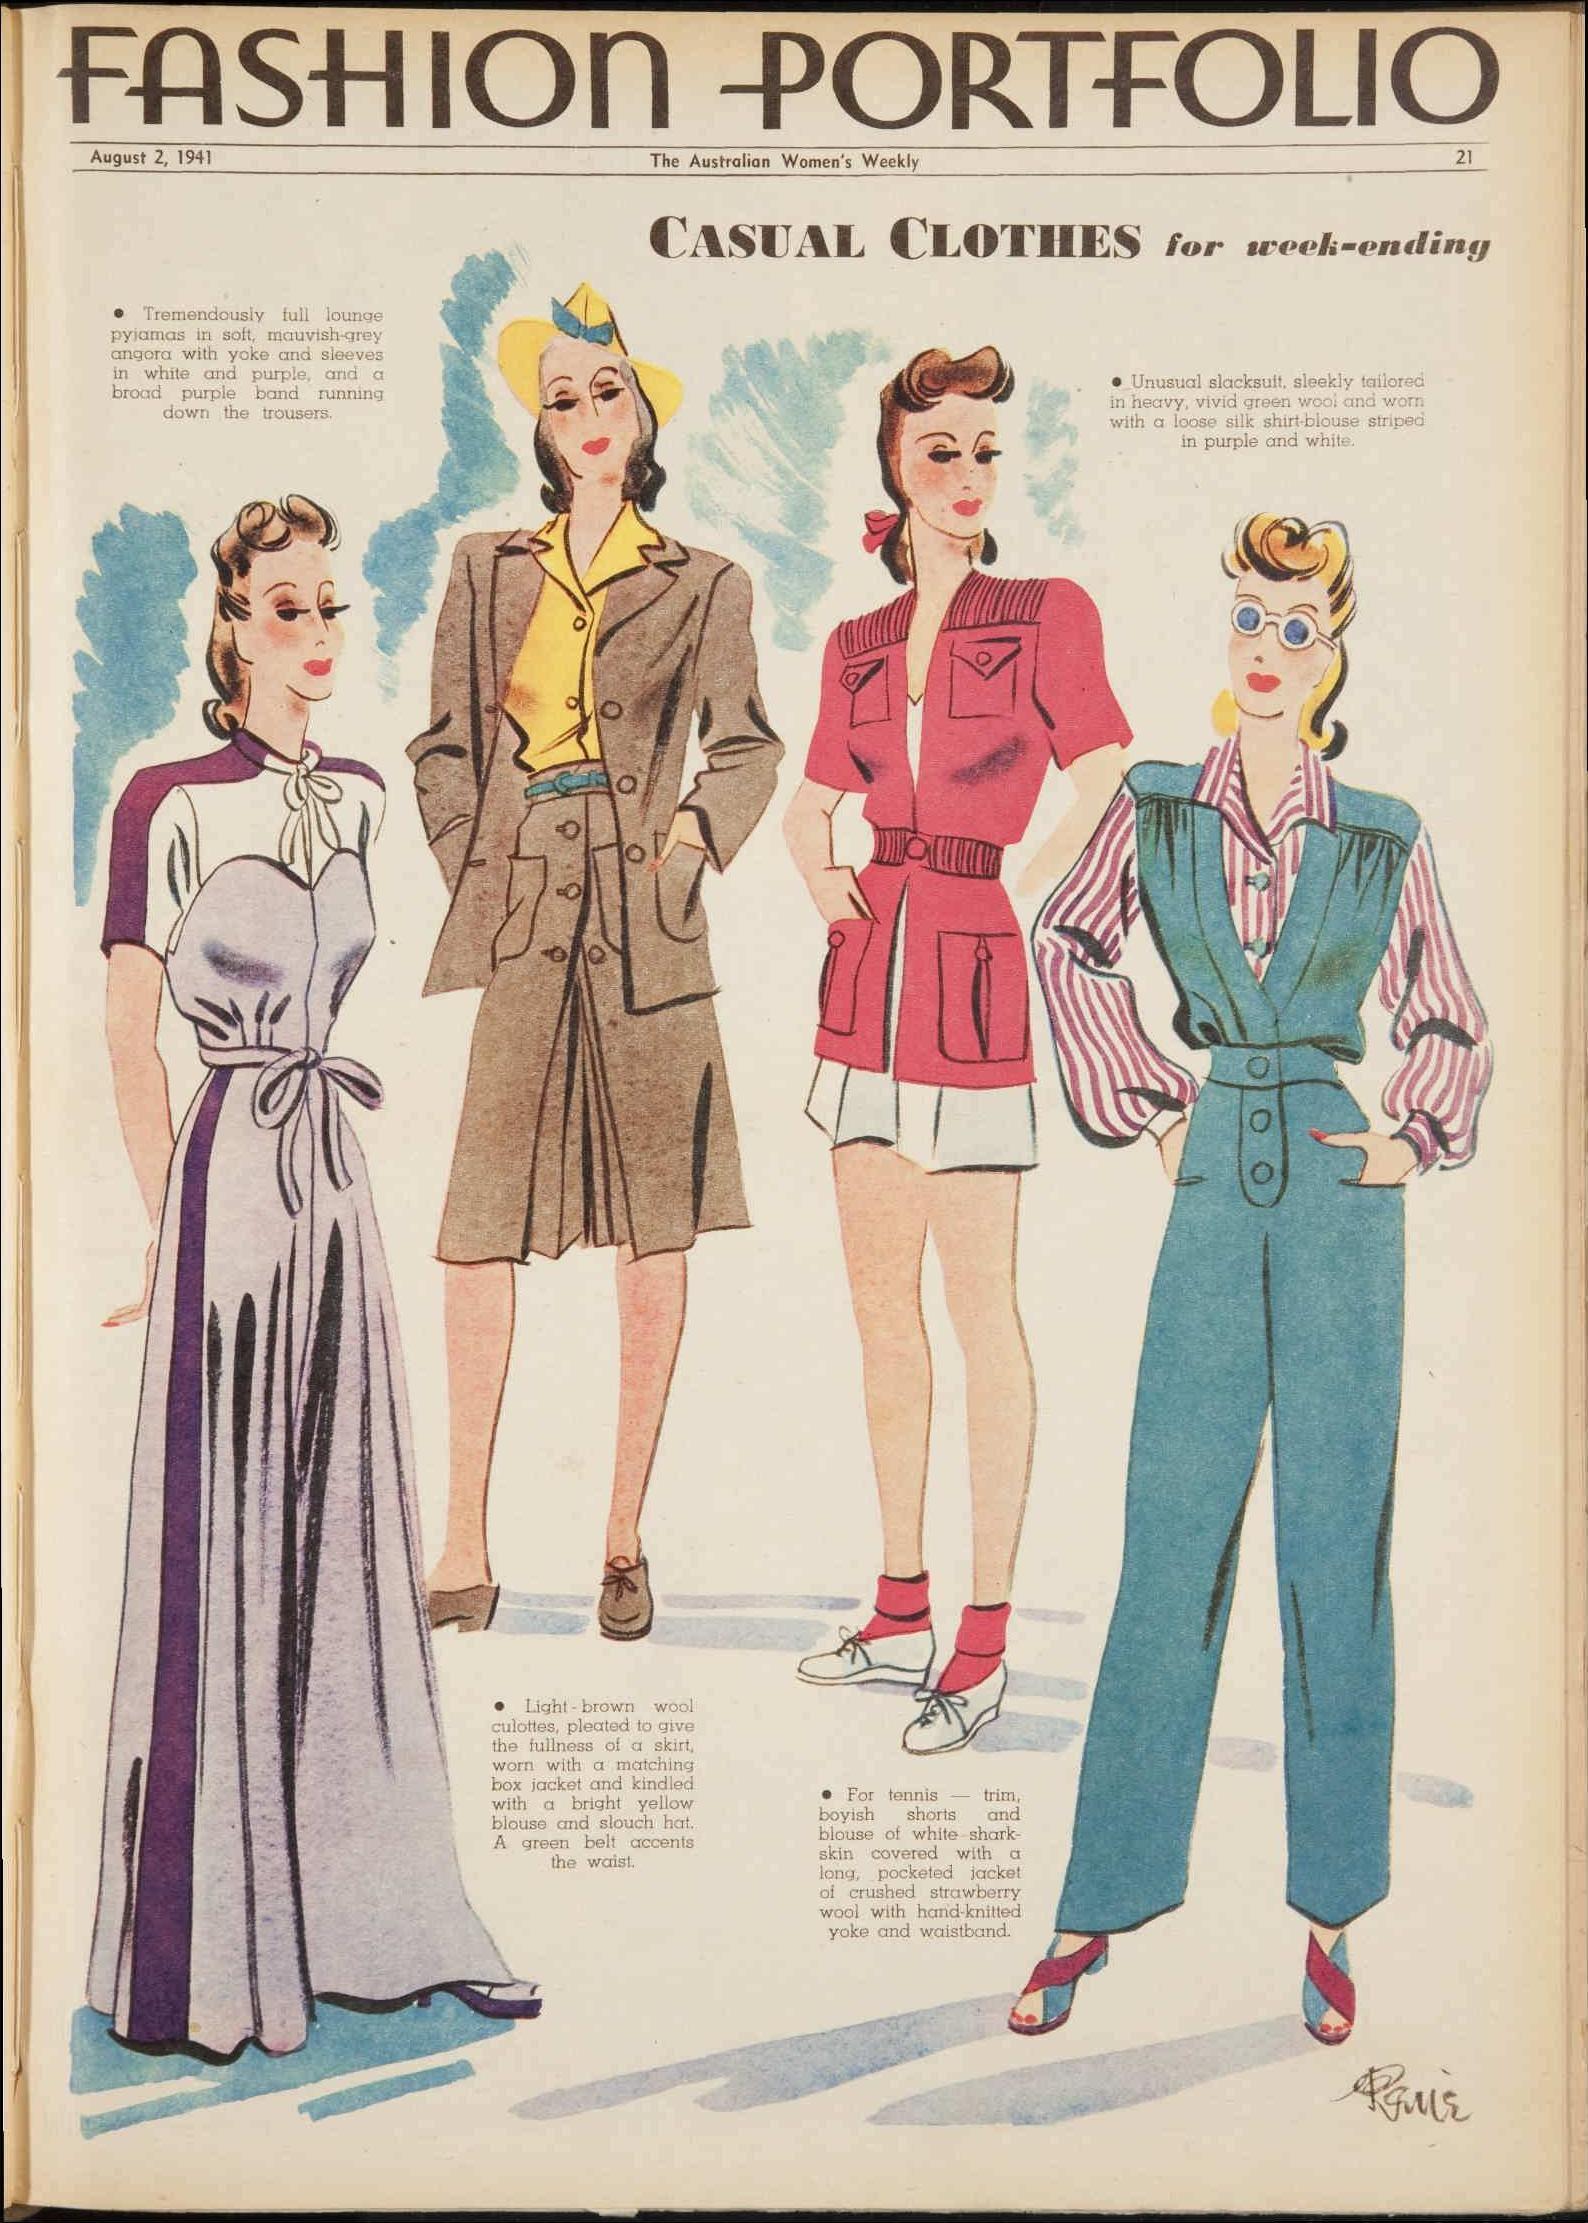 2 Aug 1941 - The Australian Women's Weekly